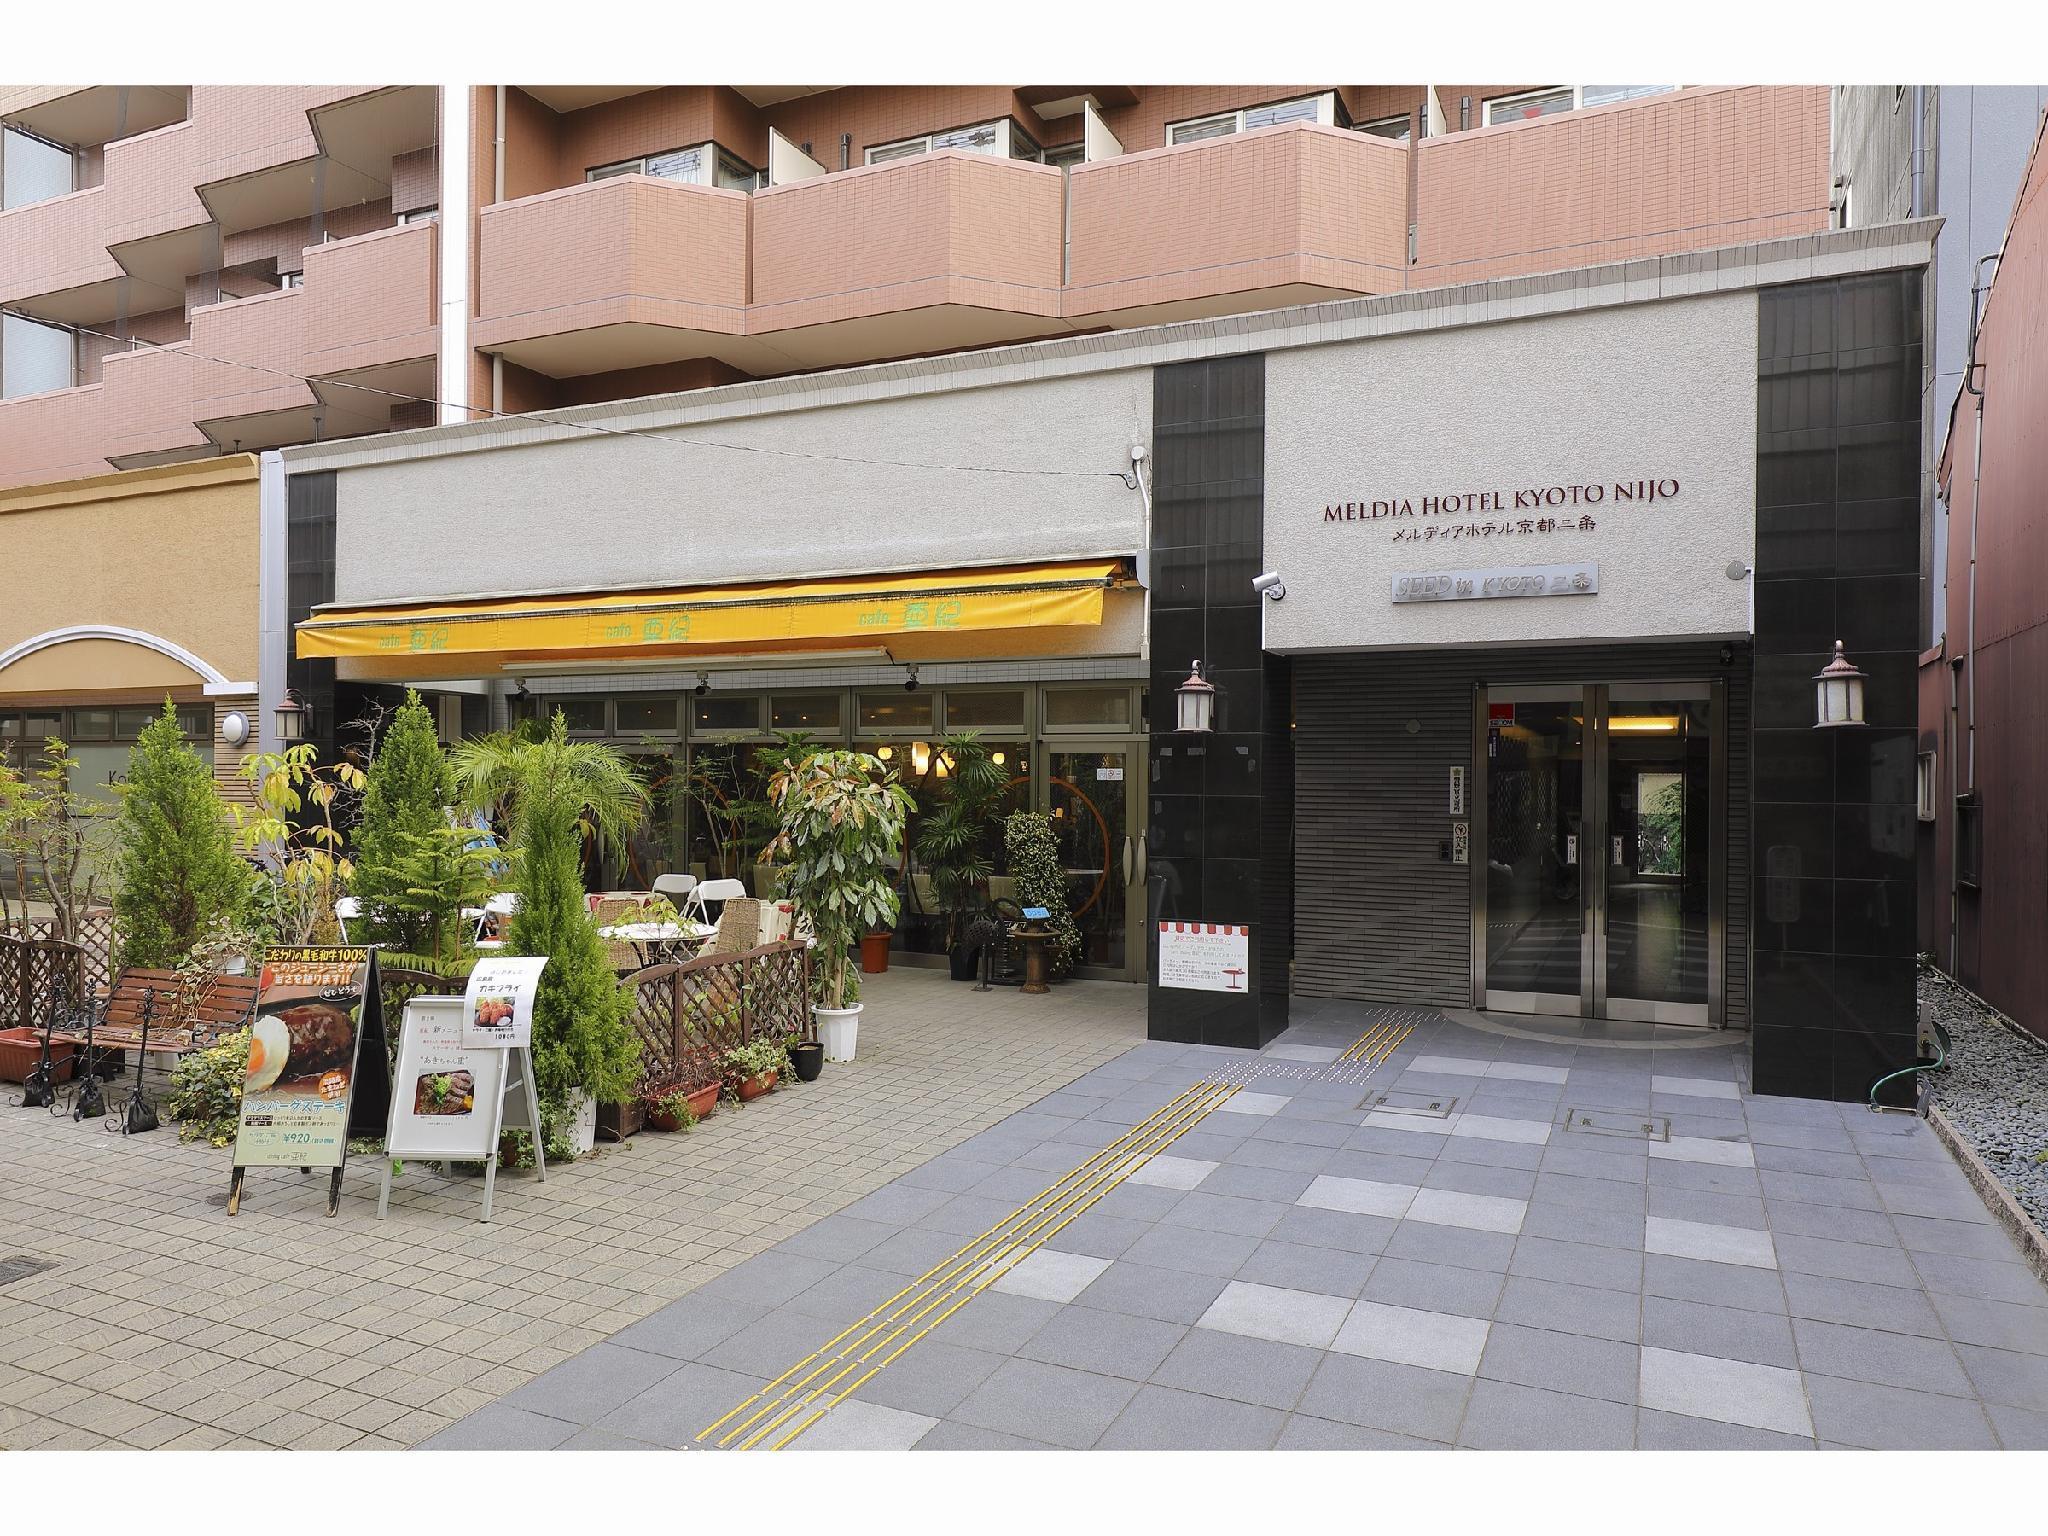 Meldiahotel Kyotonijo